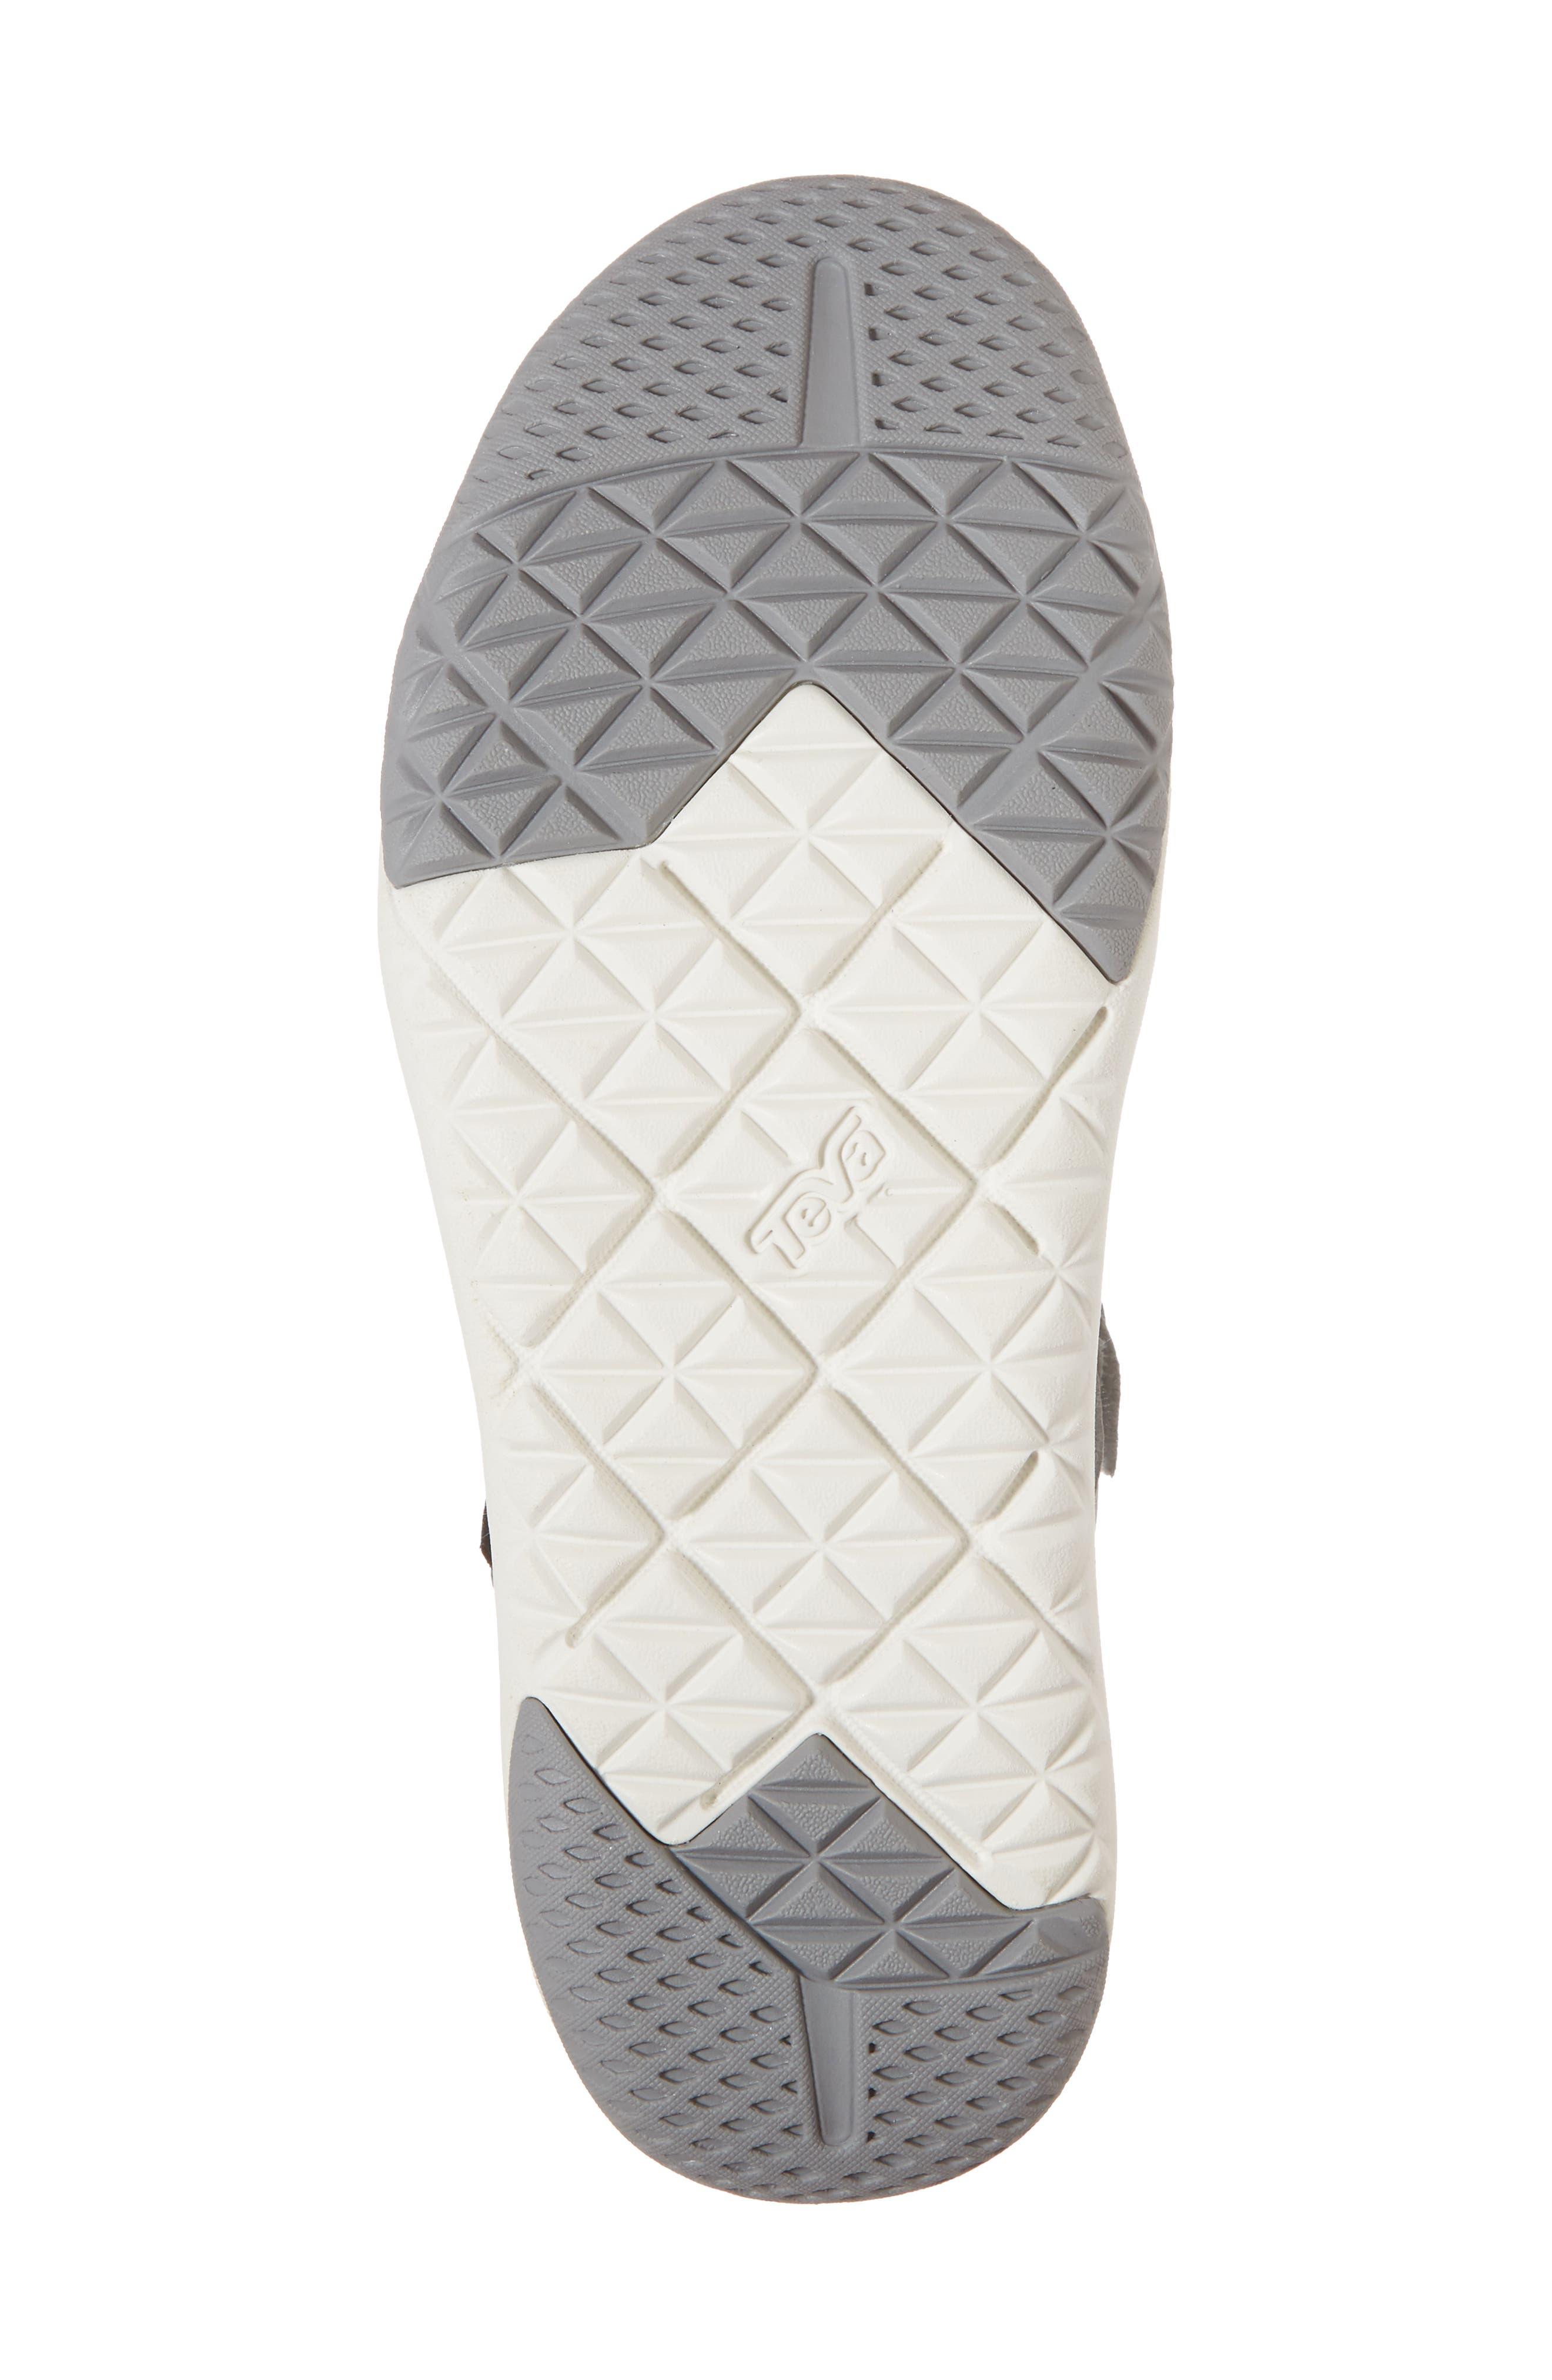 Terra Float Travel Knit Active Sandal,                             Alternate thumbnail 6, color,                             036